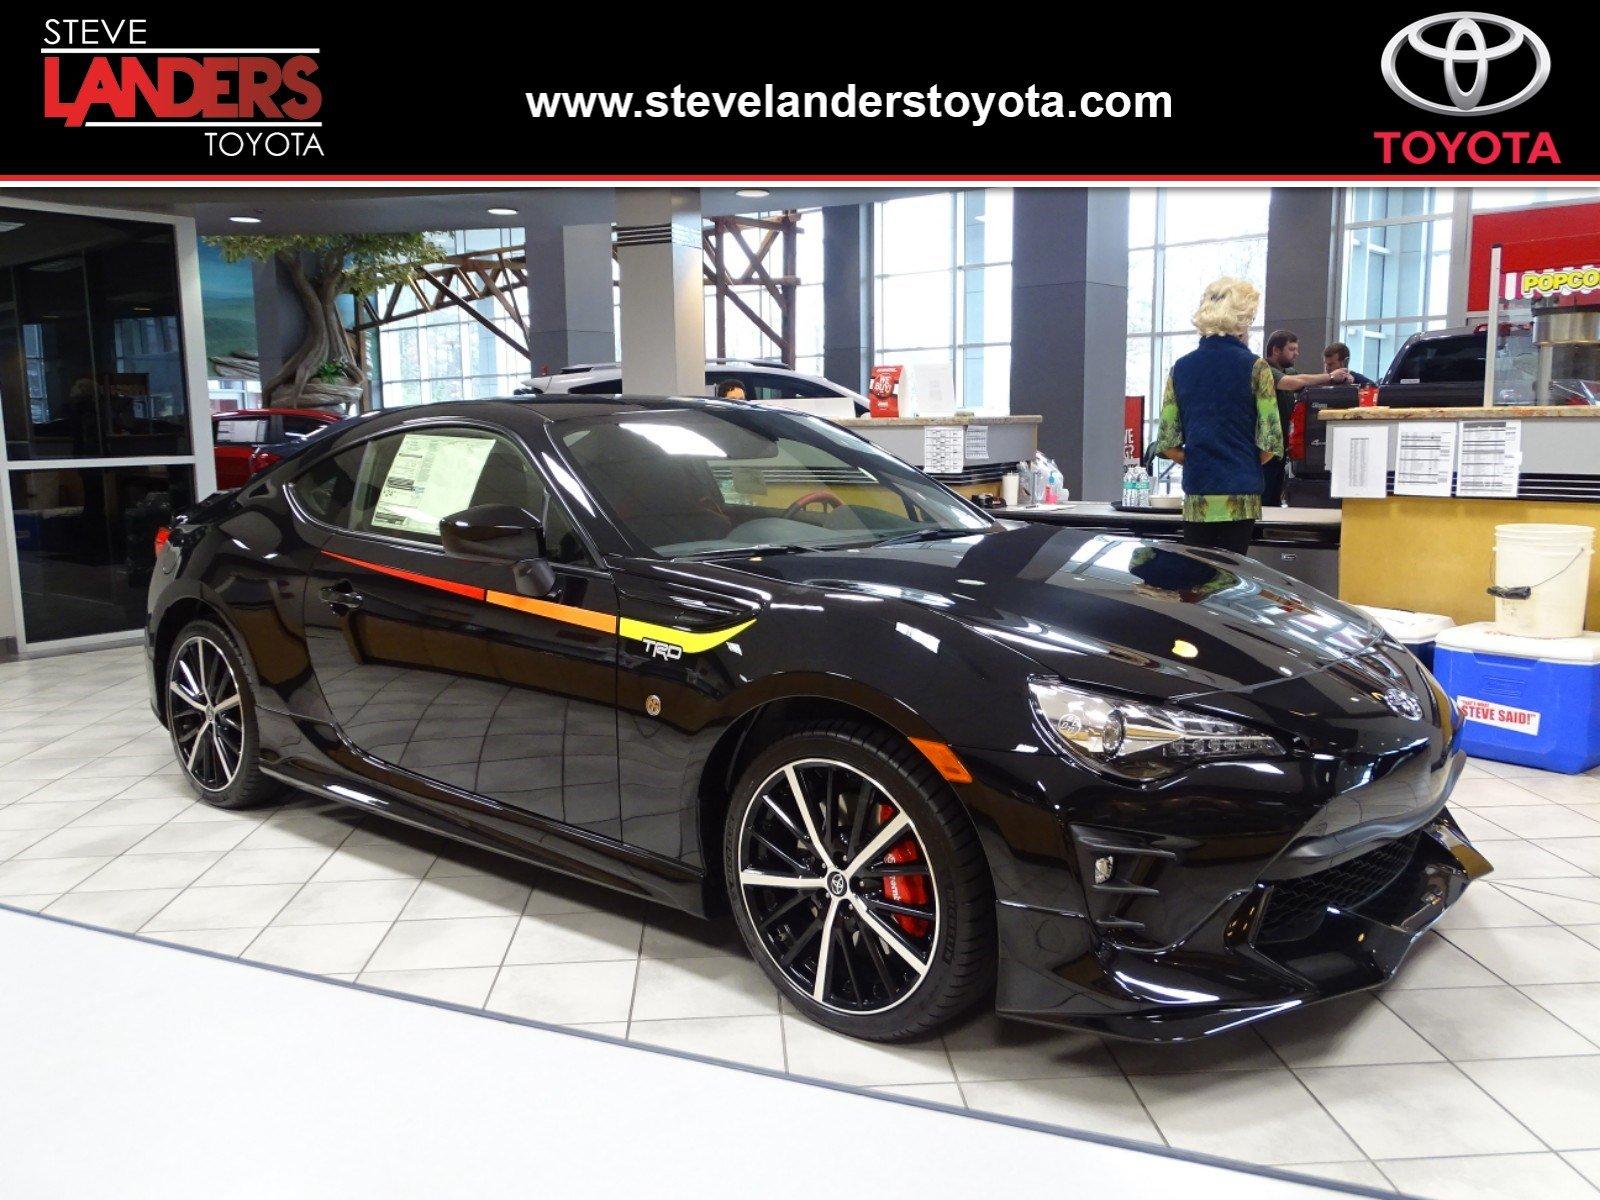 2019 Toyota 86 TRD SE Coupe